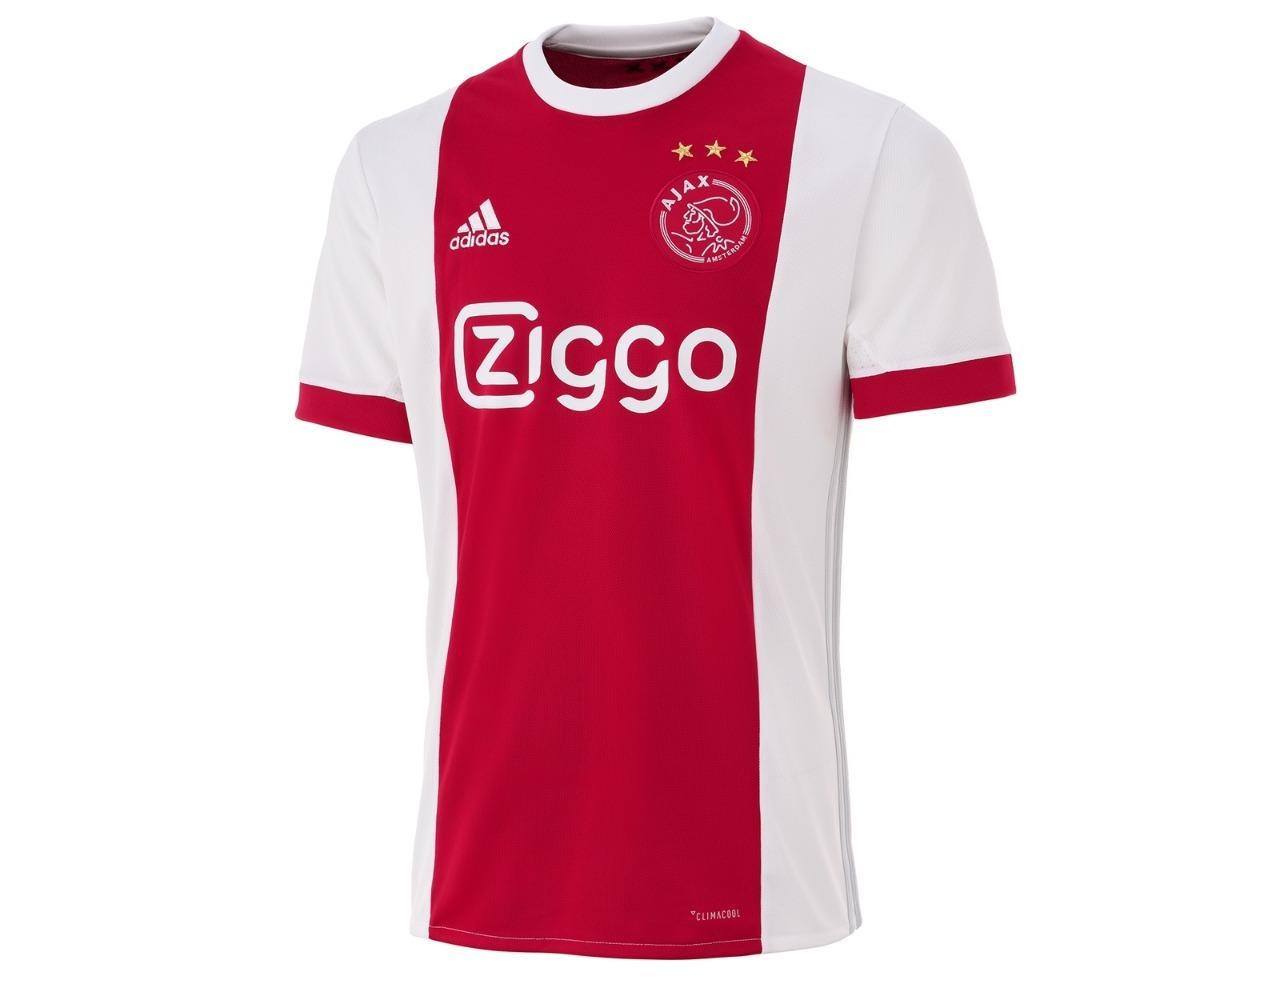 Zoc - Jersey Olahraga Sepak Bola Timnas Ajax Home 2018 - 2019